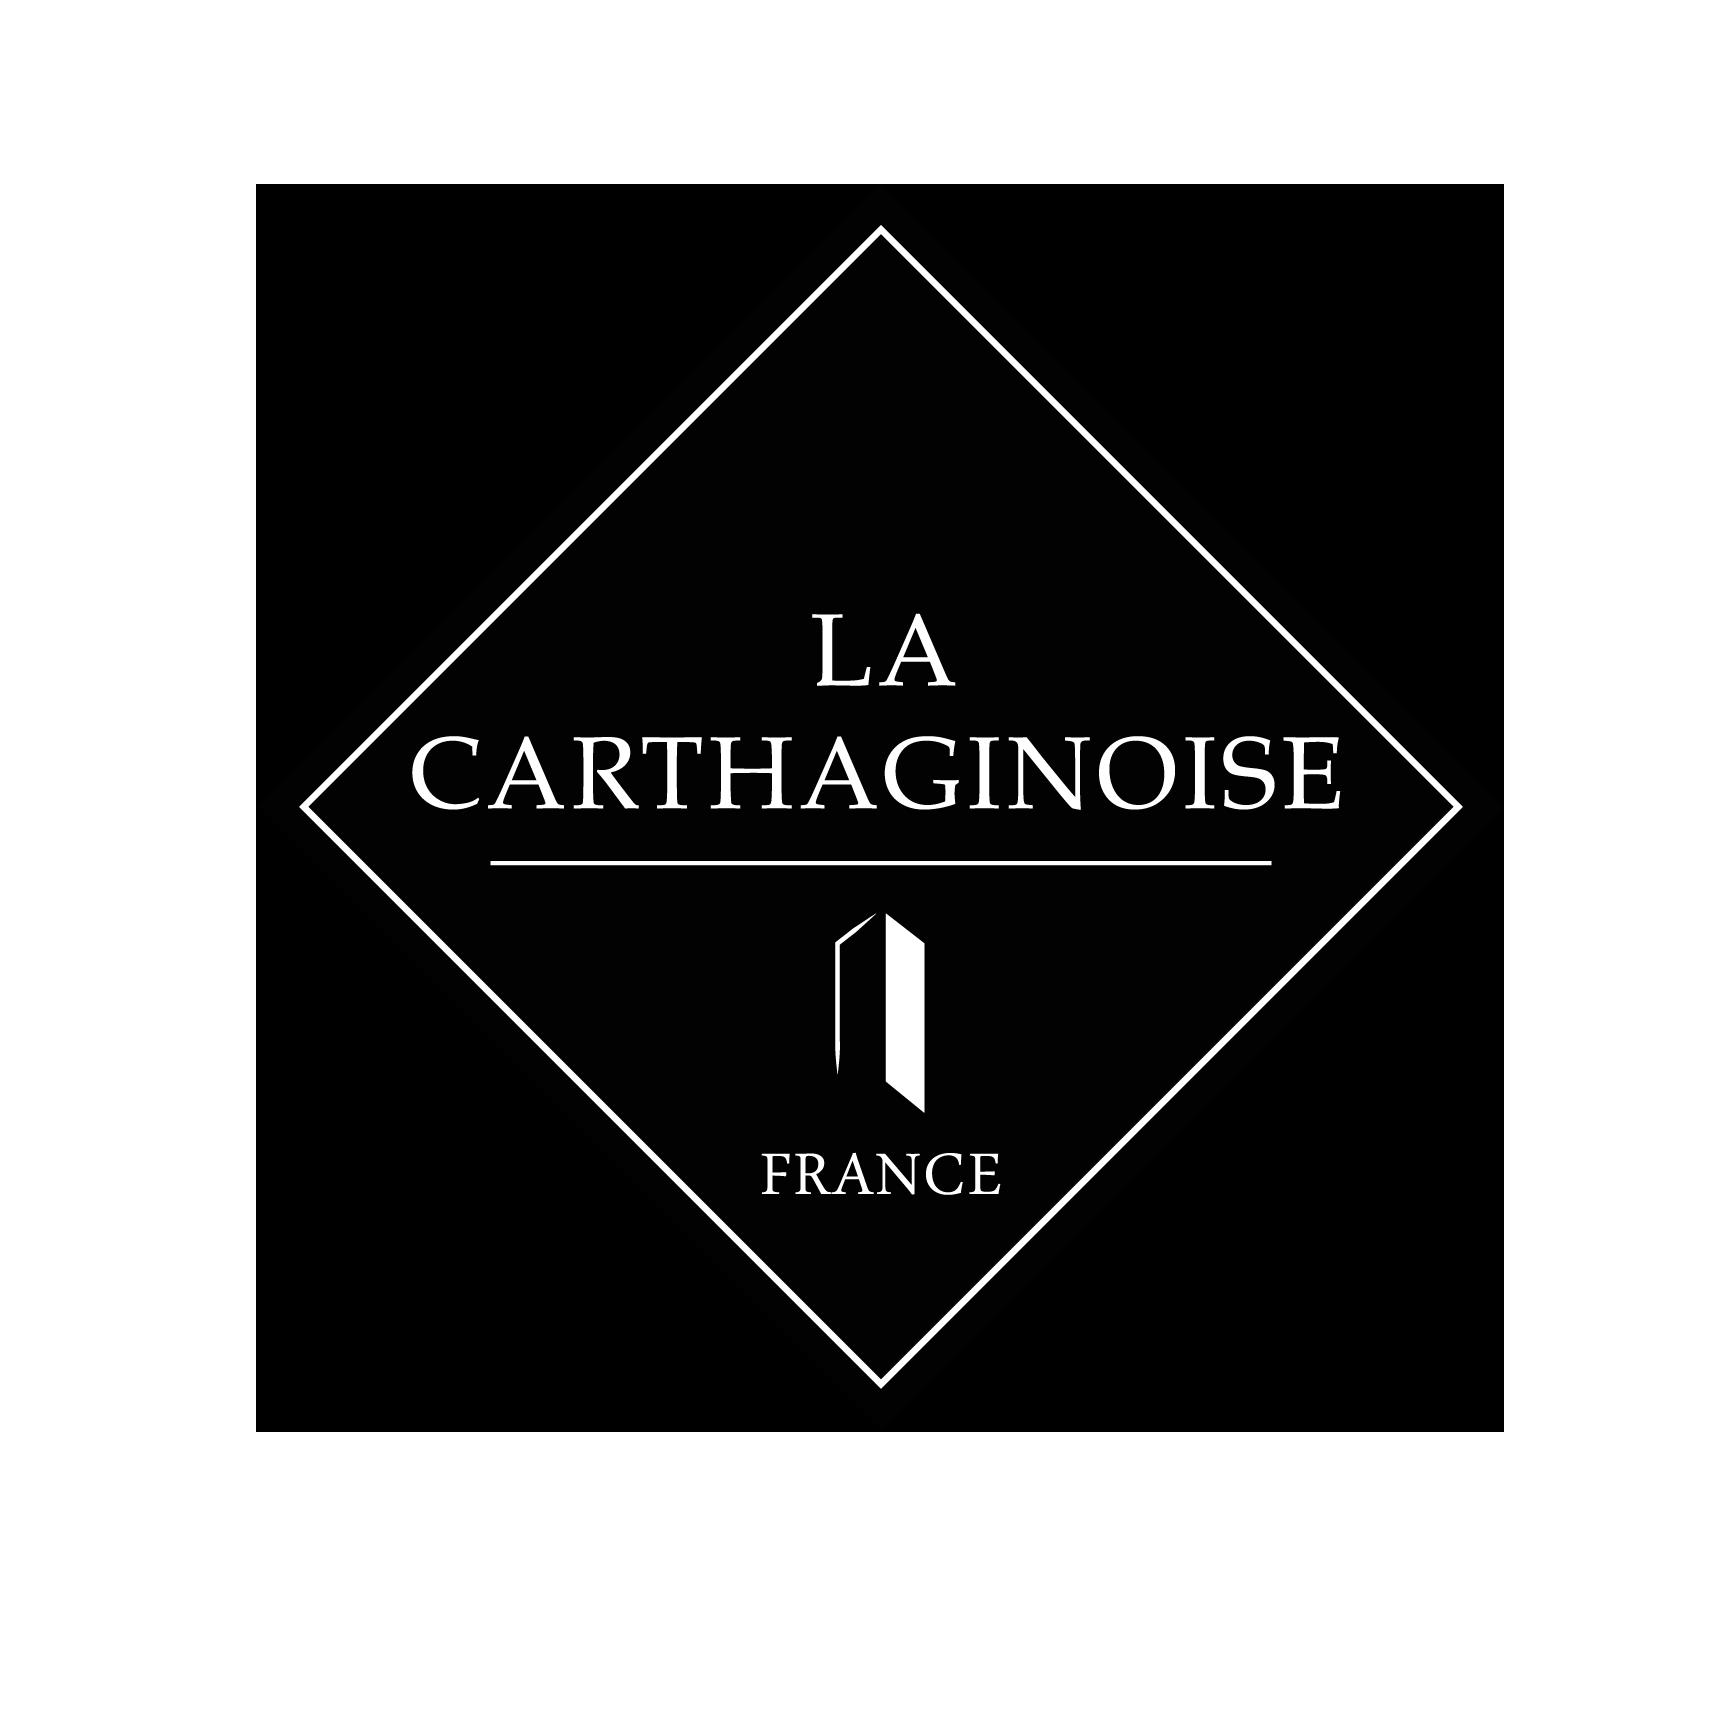 La Carthaginoise